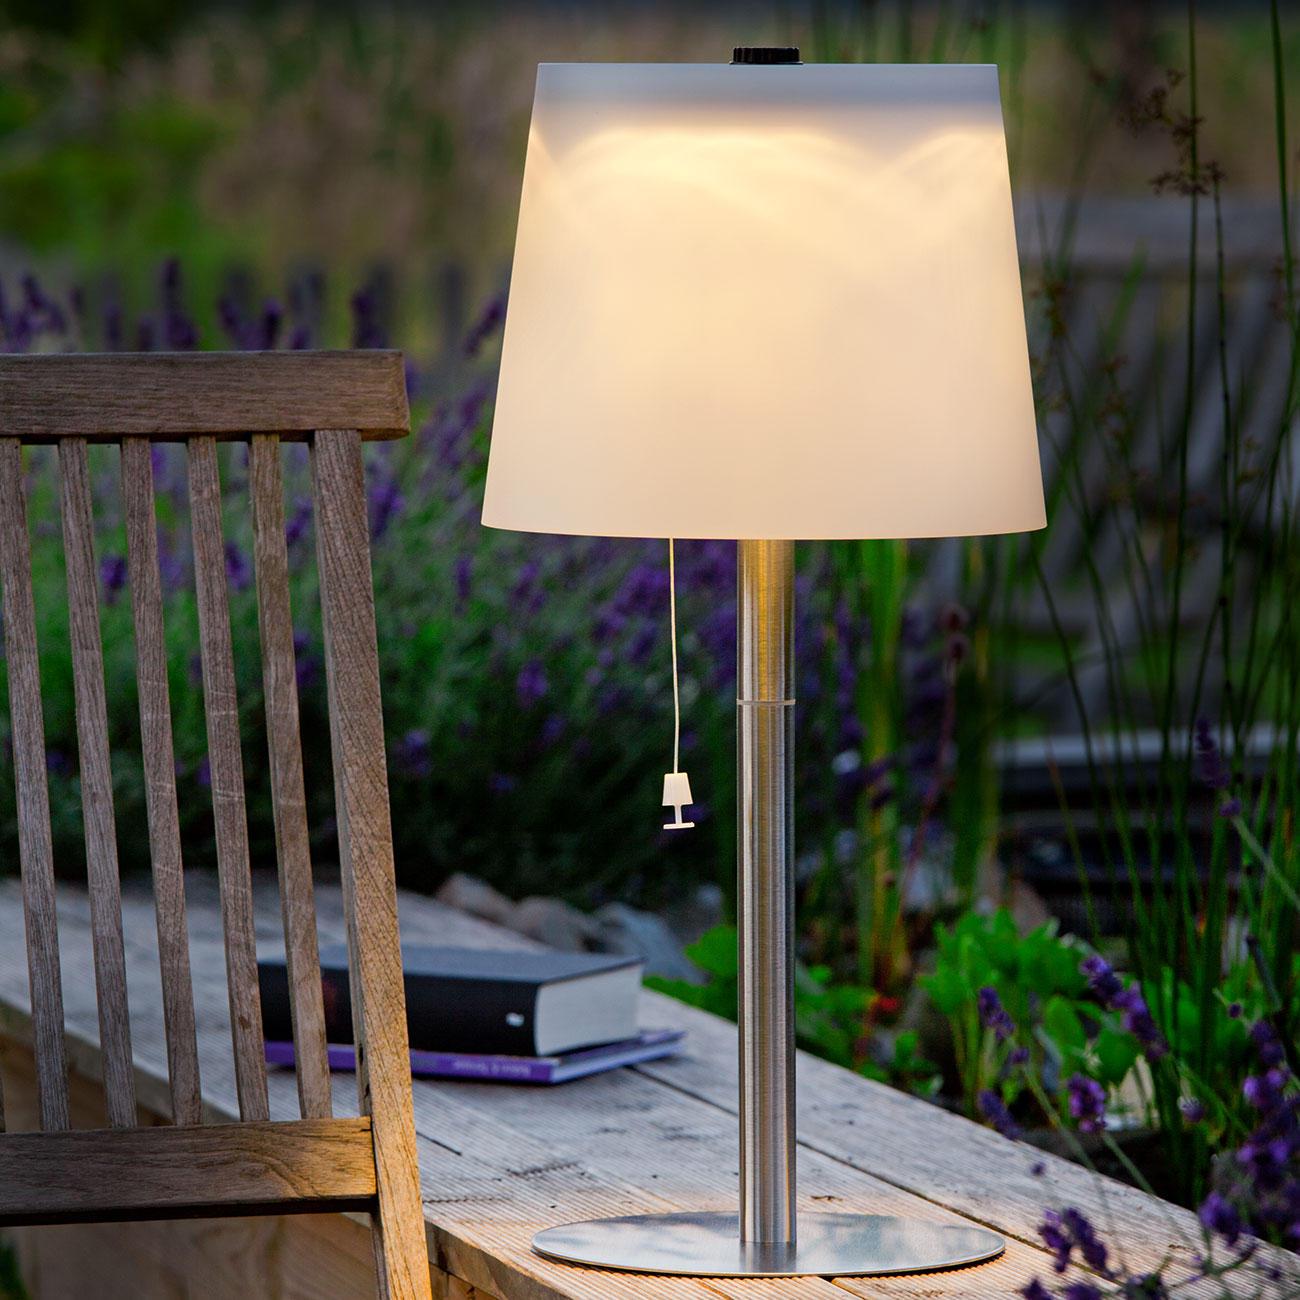 solar tischleuchte oder h ngeleuchte online kaufen. Black Bedroom Furniture Sets. Home Design Ideas